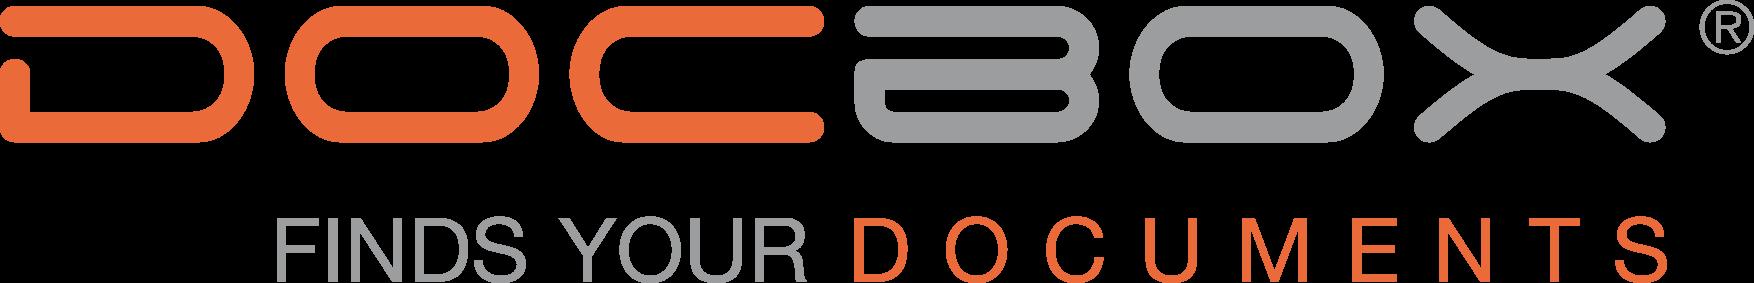 Logo des Dokumenten-Management-Systems Docbox